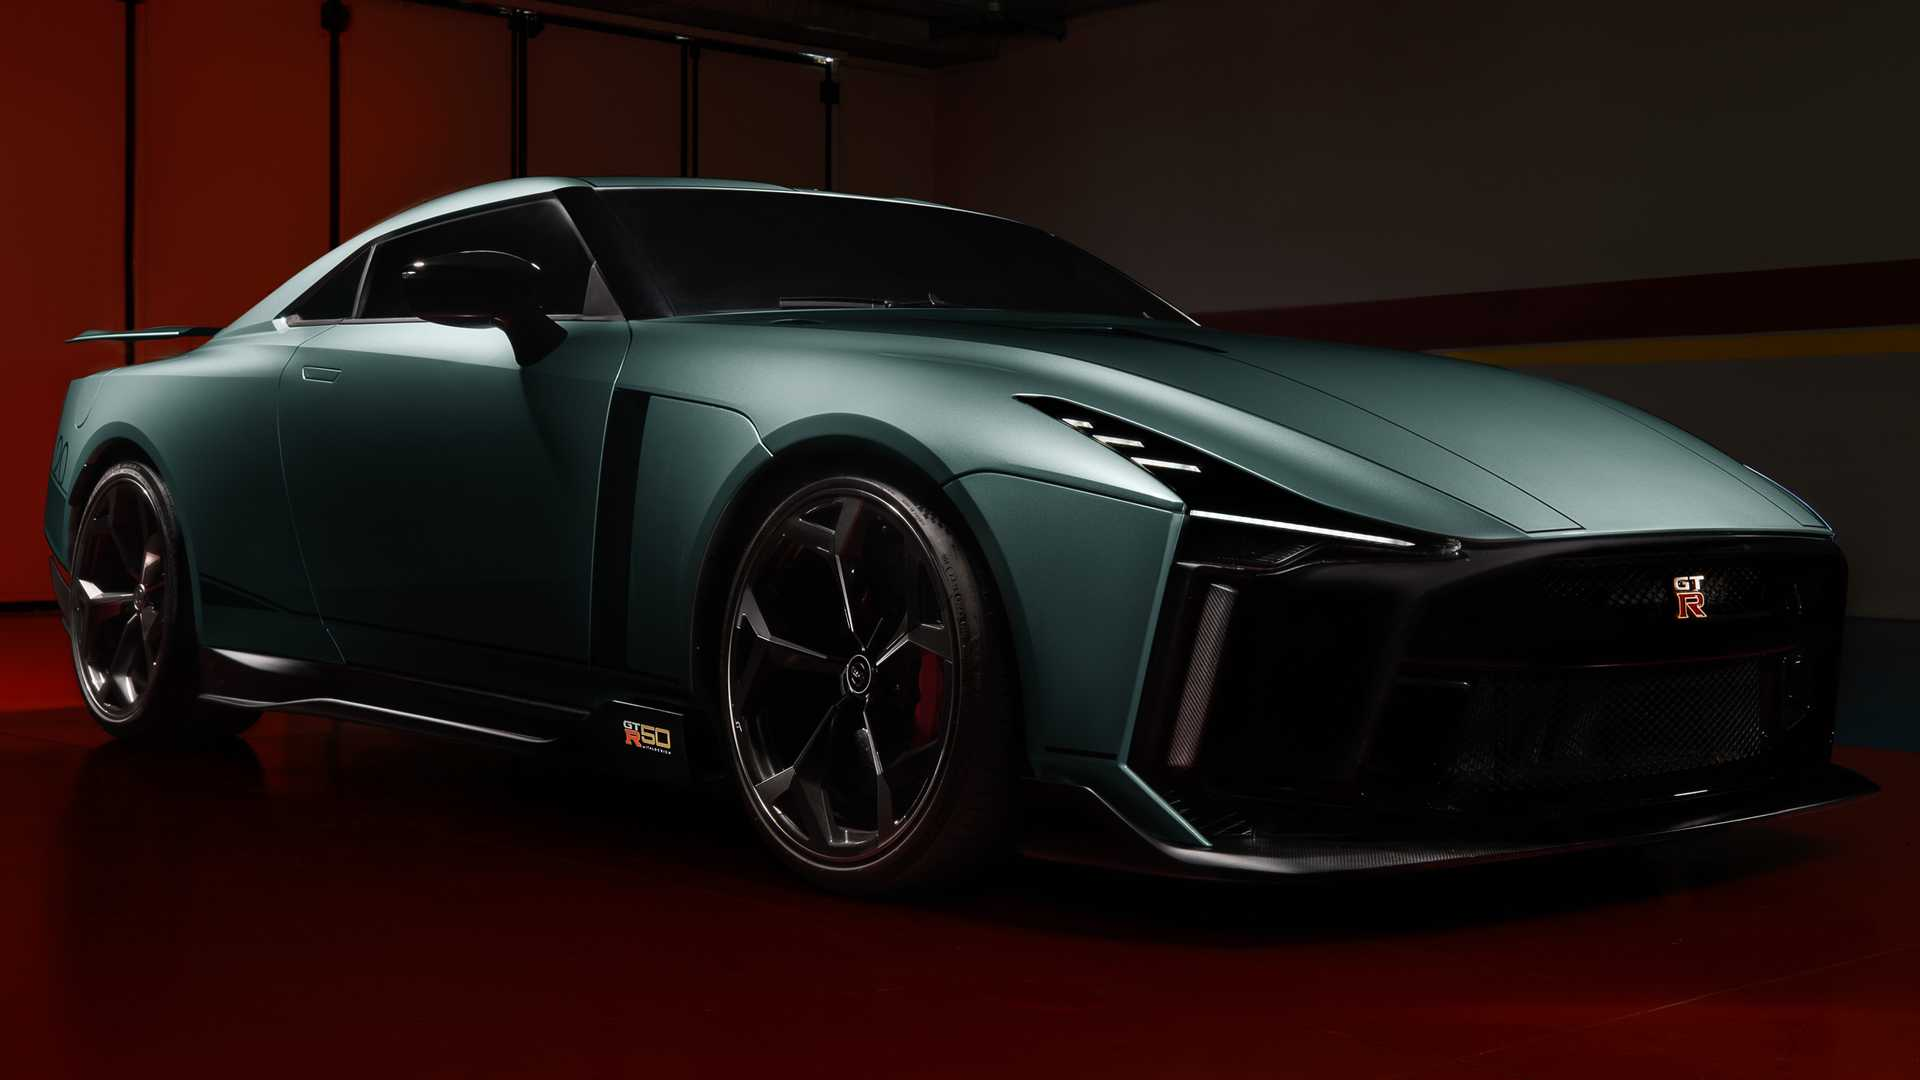 Nismo Talks Nissan GT-R50 Engine, Touts Quicker Acceleration - Motor1